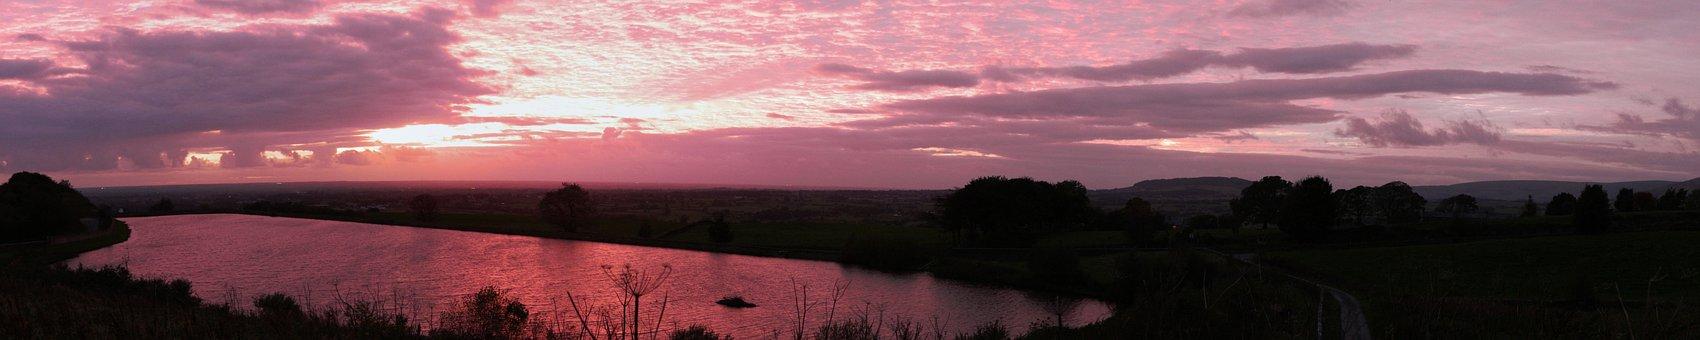 Sunset, Nature, Panoramic, Wide, Reflection, Sun, Warm